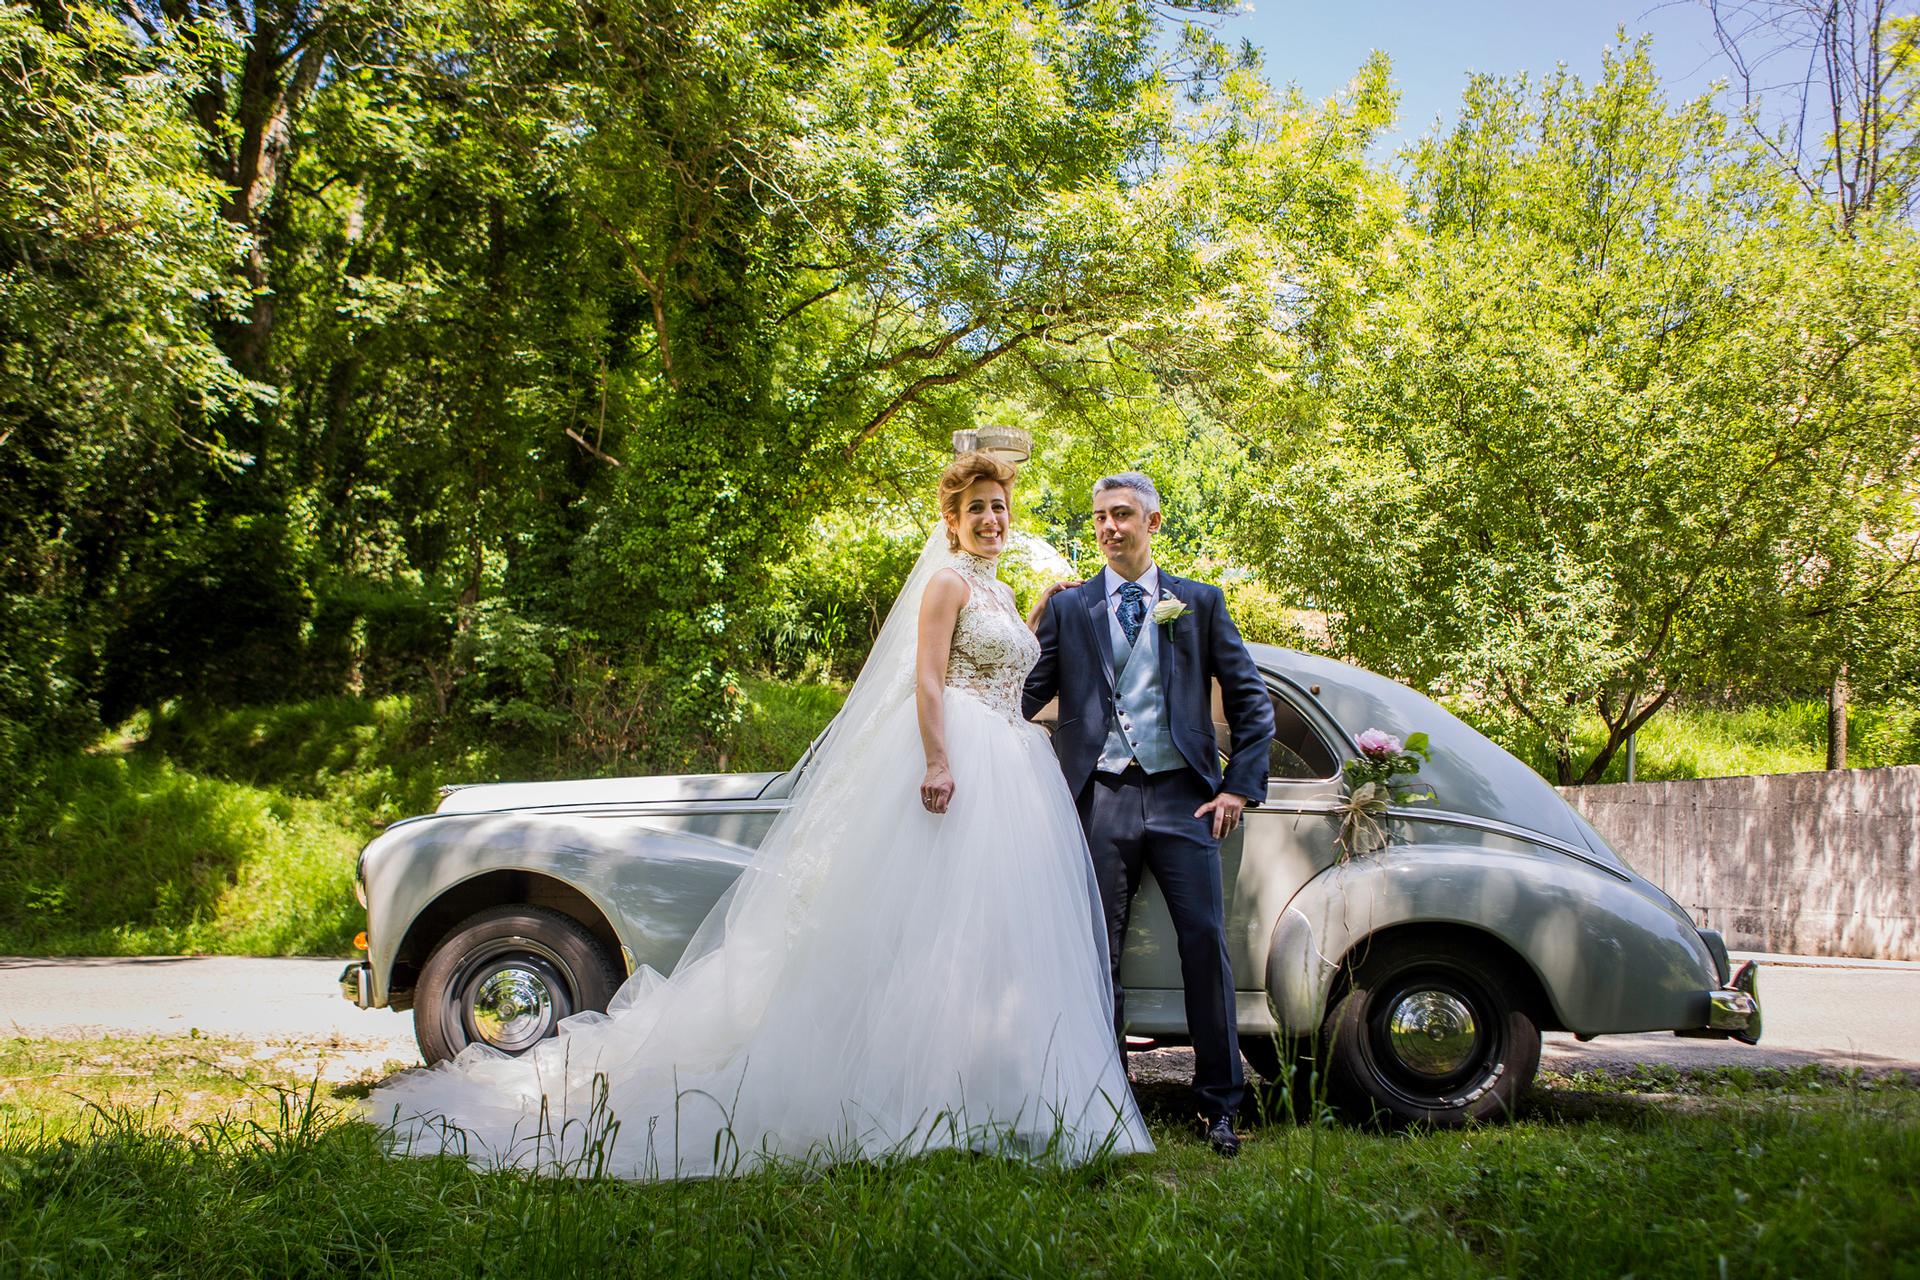 Wedding & Event Planner - Destination Wedding en San Sebastián - Boda Lara y Gelo 04